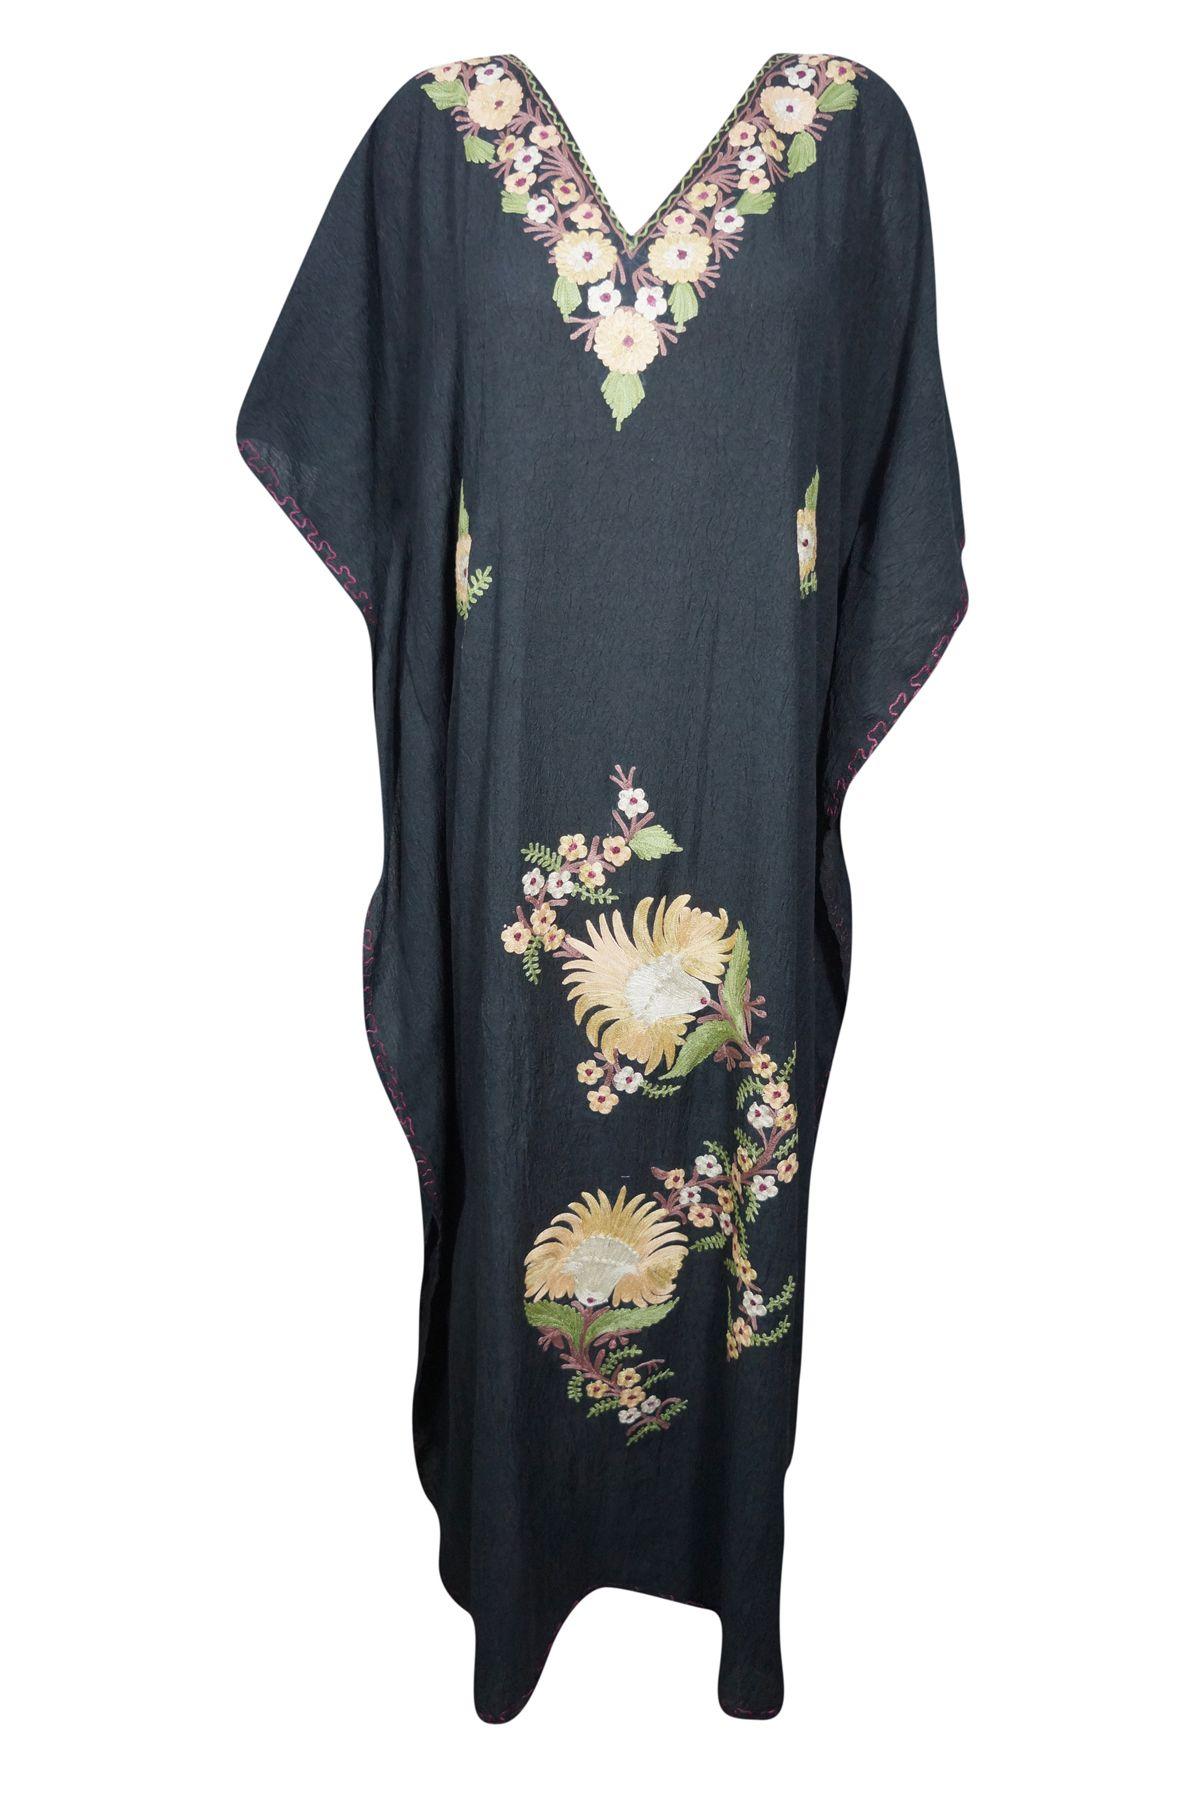 Women S Black Embroidered Maxi Caftan Dress Summer Cotton Cover Up Kaftan Caftan Dress Summer Dresses Maxi Caftan [ 1802 x 1200 Pixel ]